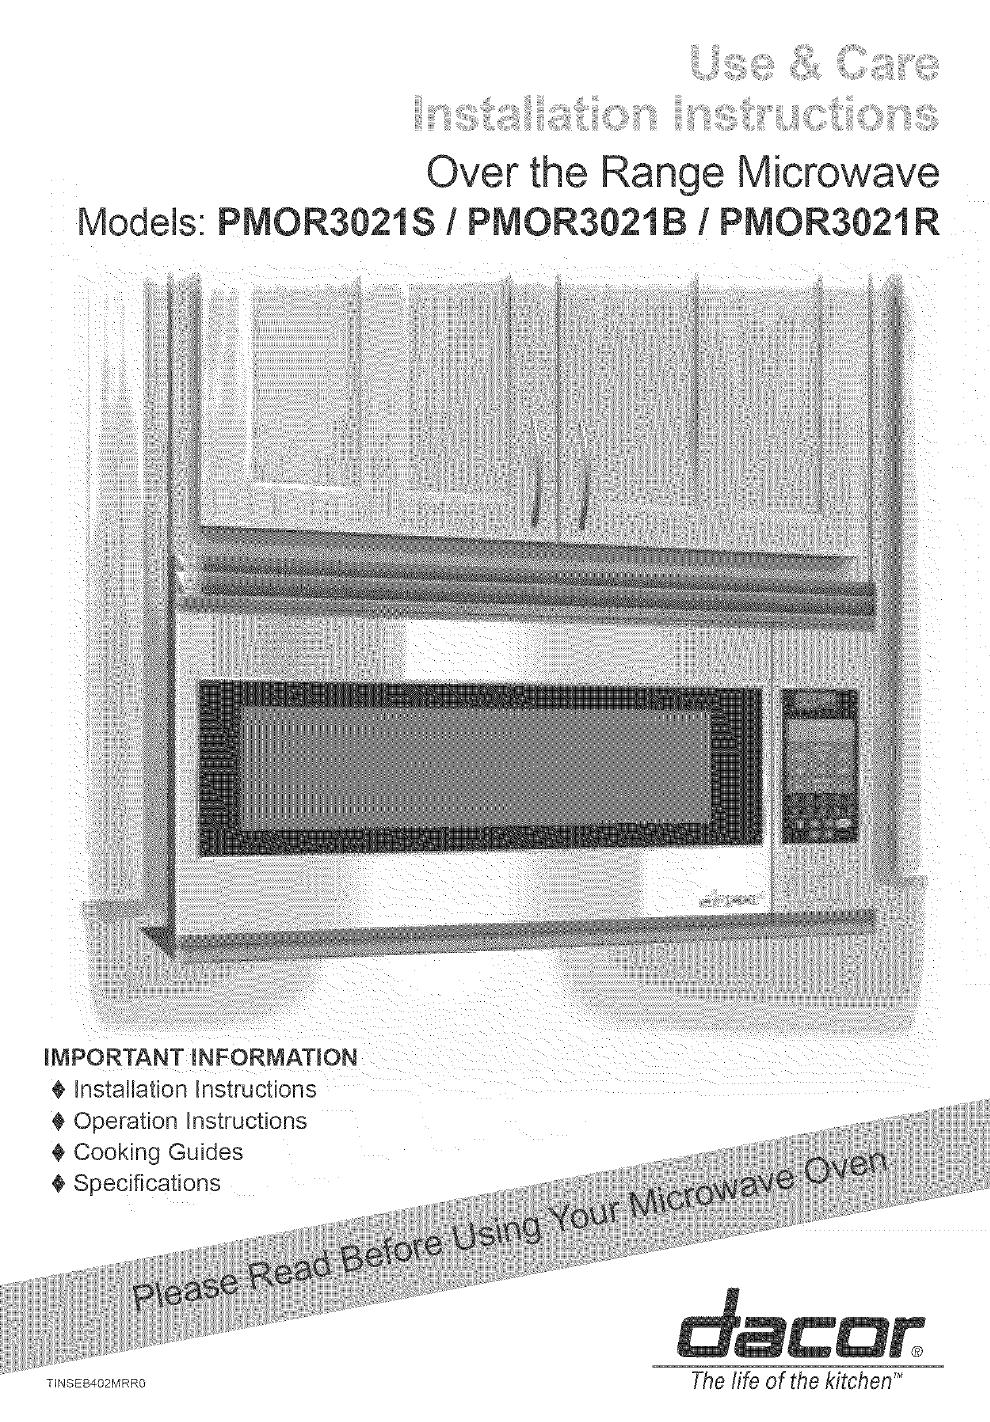 DACOR Microwave/Hood Combo Manual L0520326 on